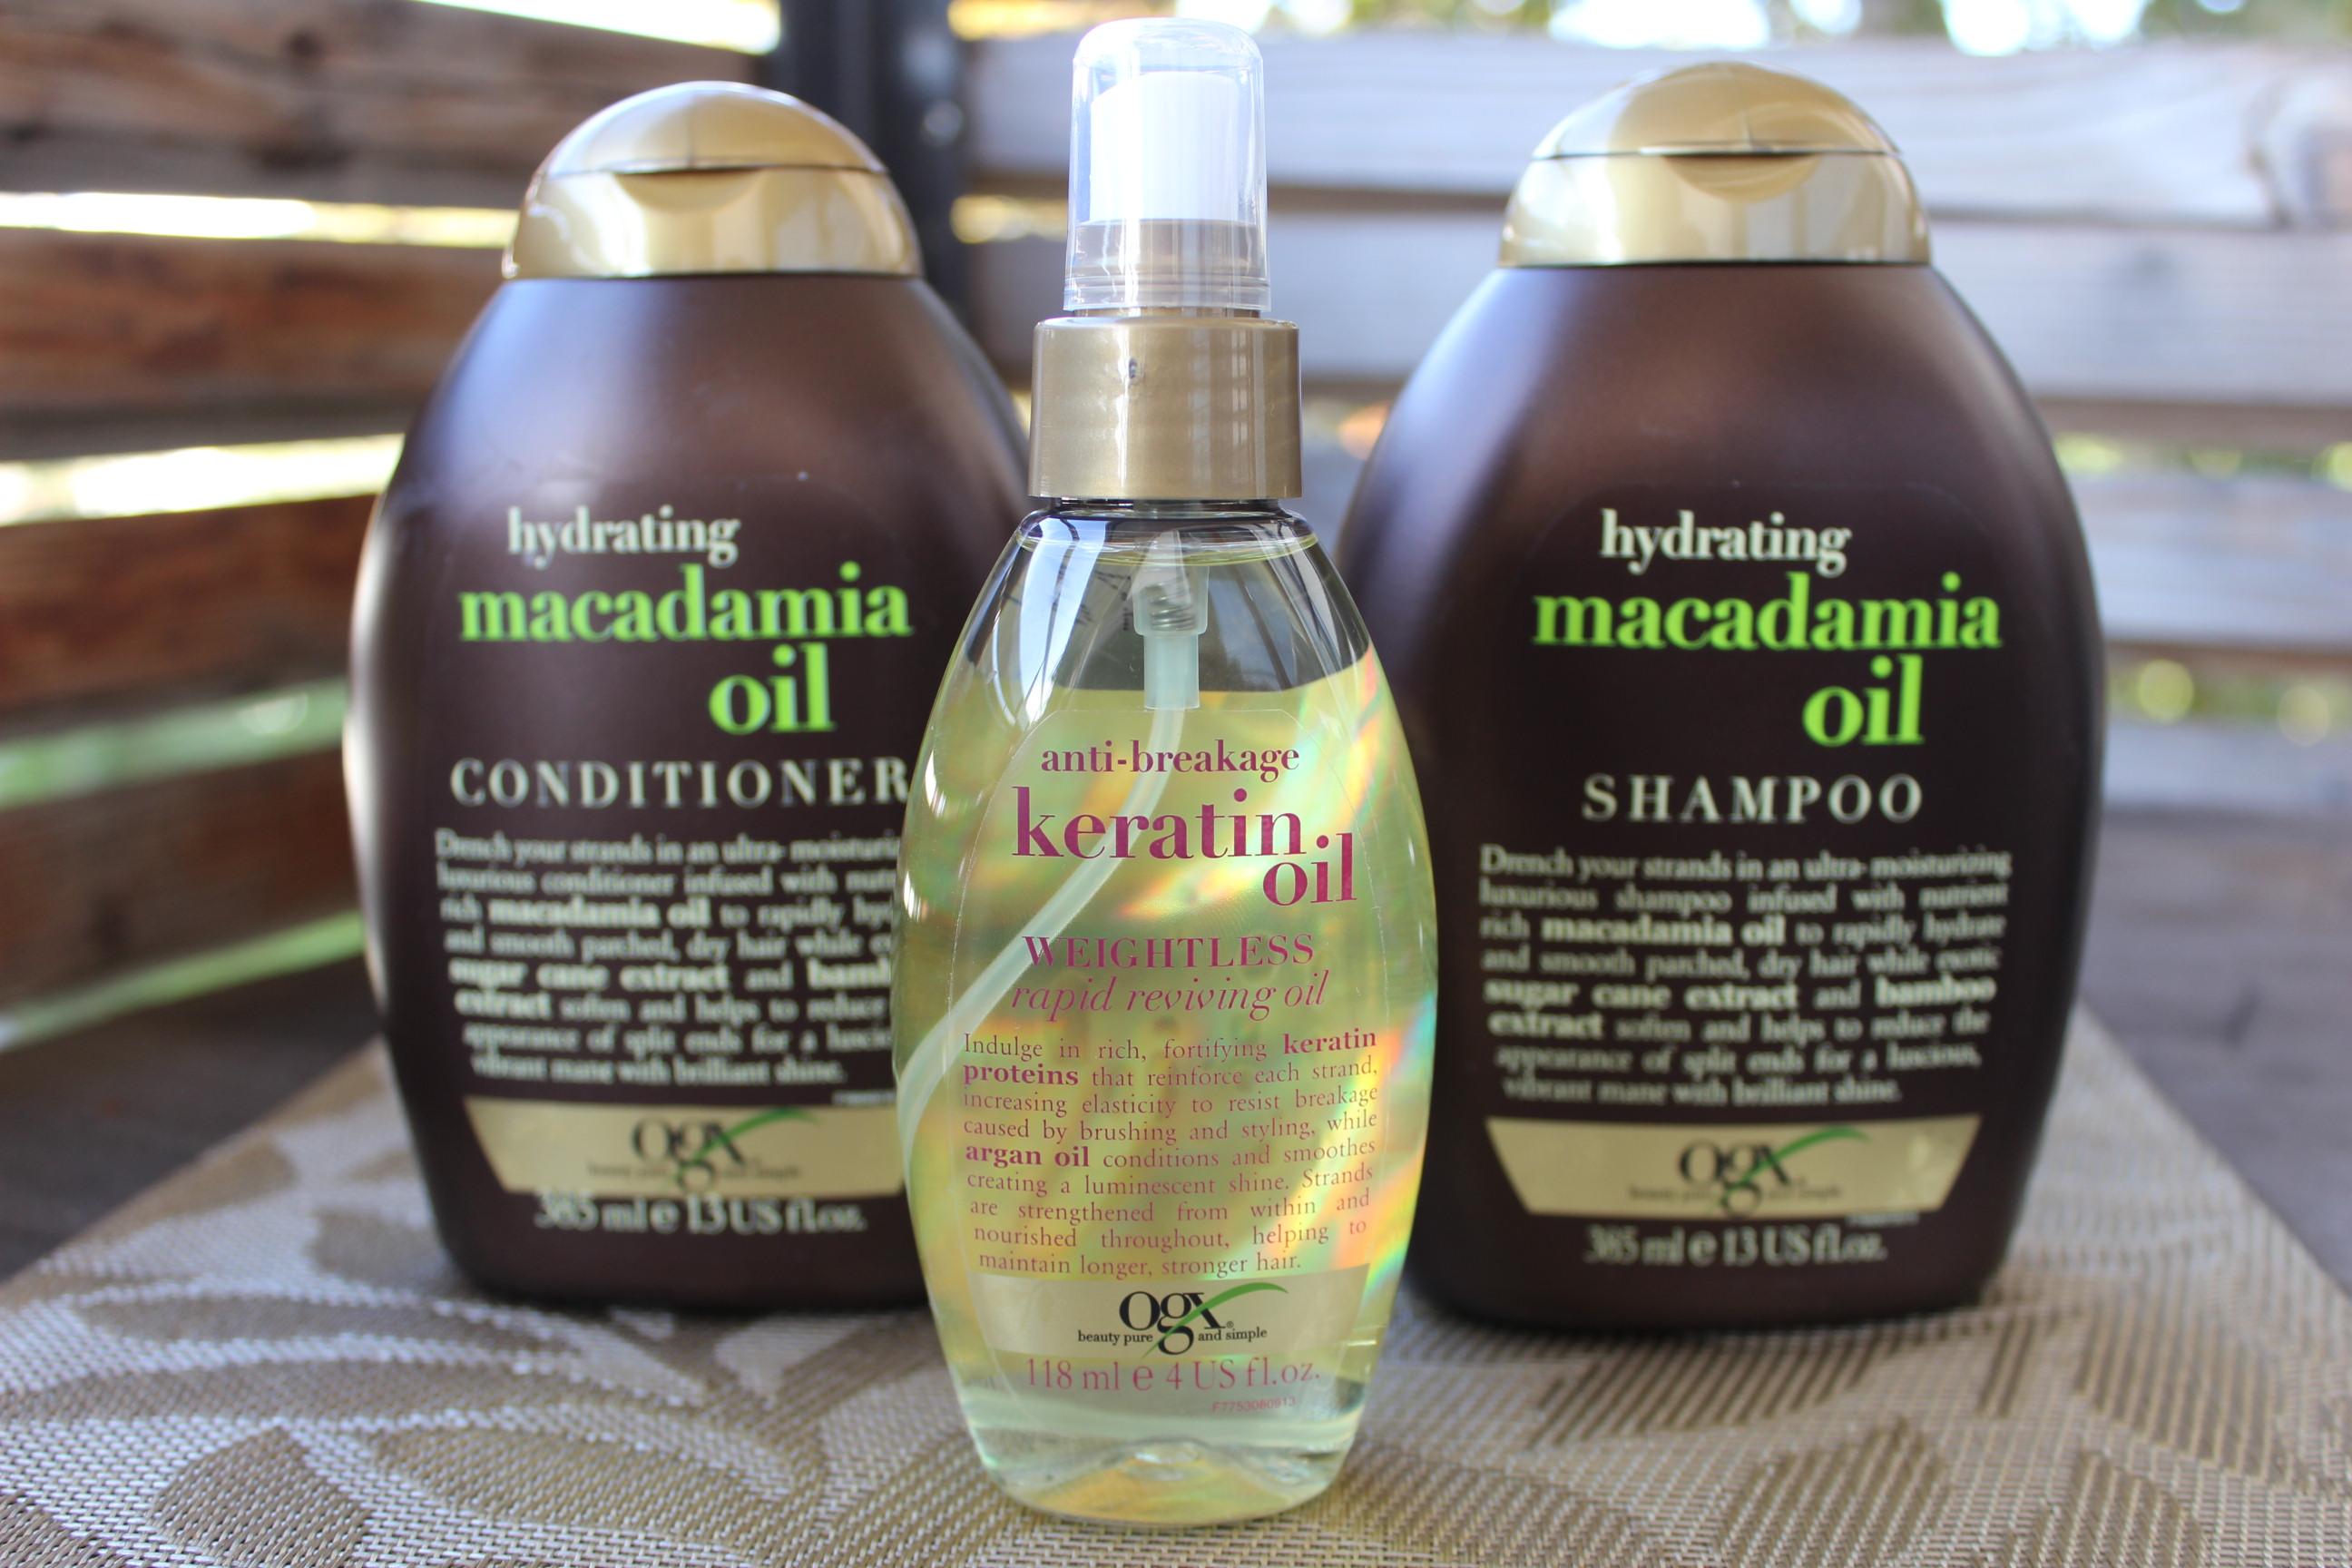 Jenni Testet Organix Macadamia Oil Shampoo Und Conditioner